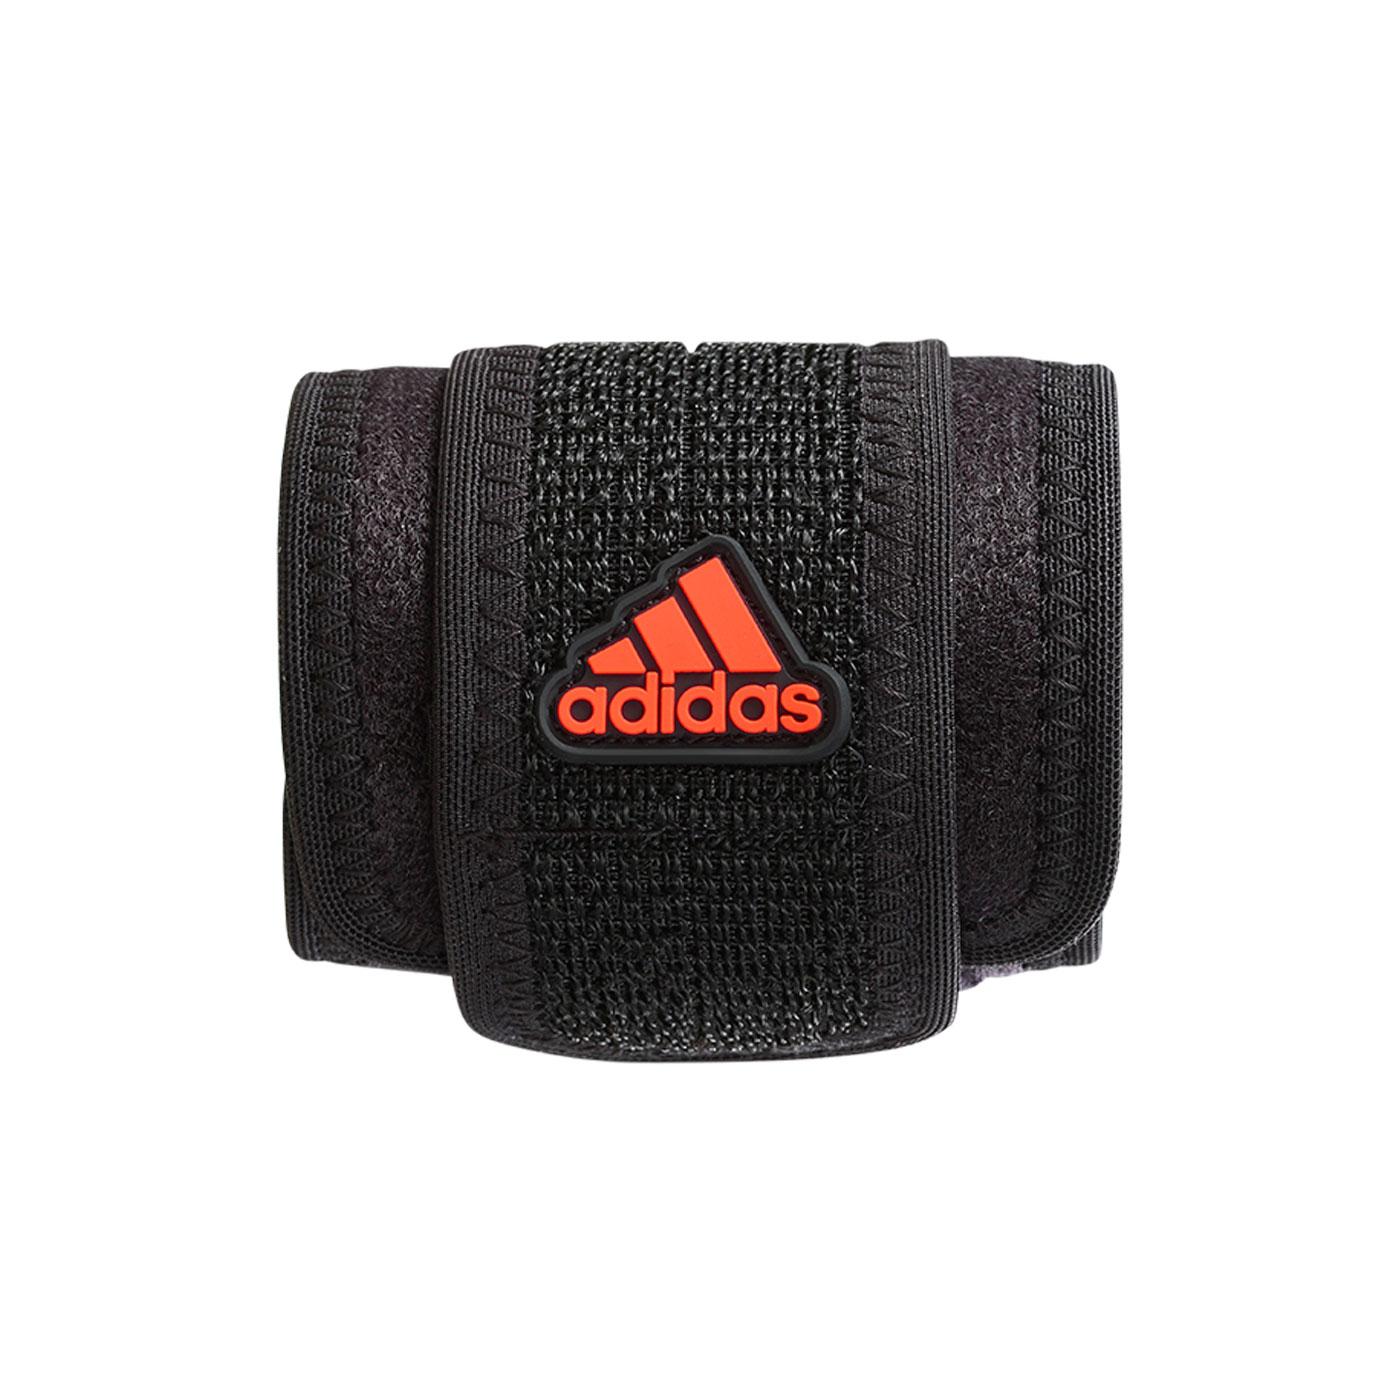 ADIDAS護具 特定-運動護腕 MB0222 - 黑橘